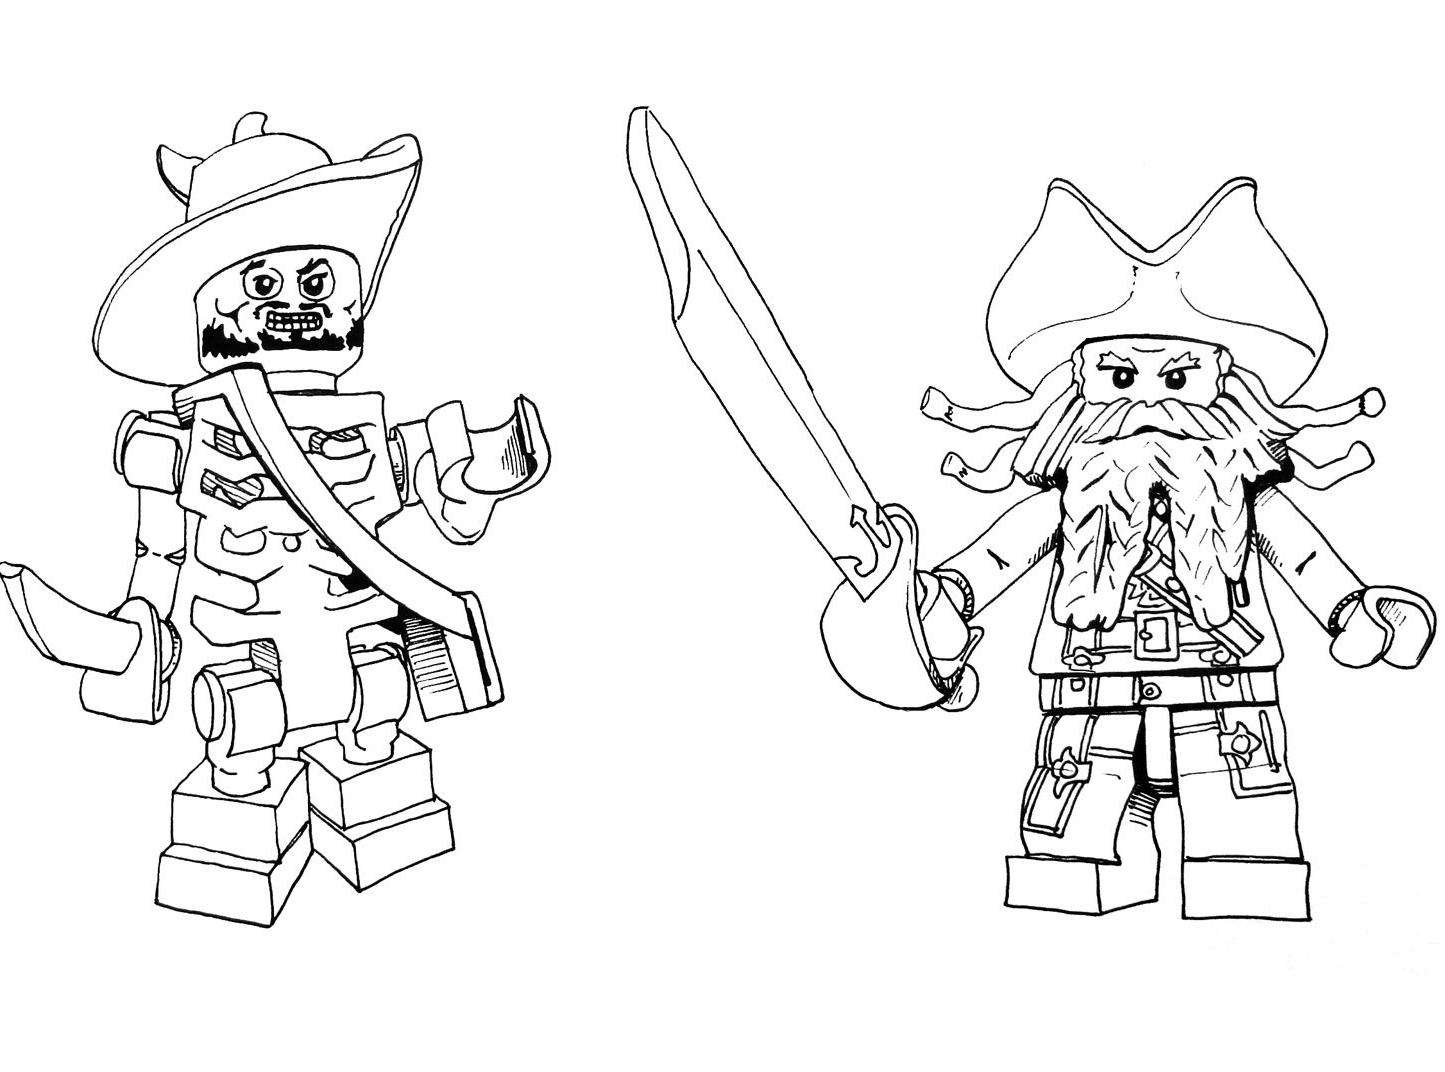 209 dibujos de Piratas para colorear | Oh Kids | Page 11